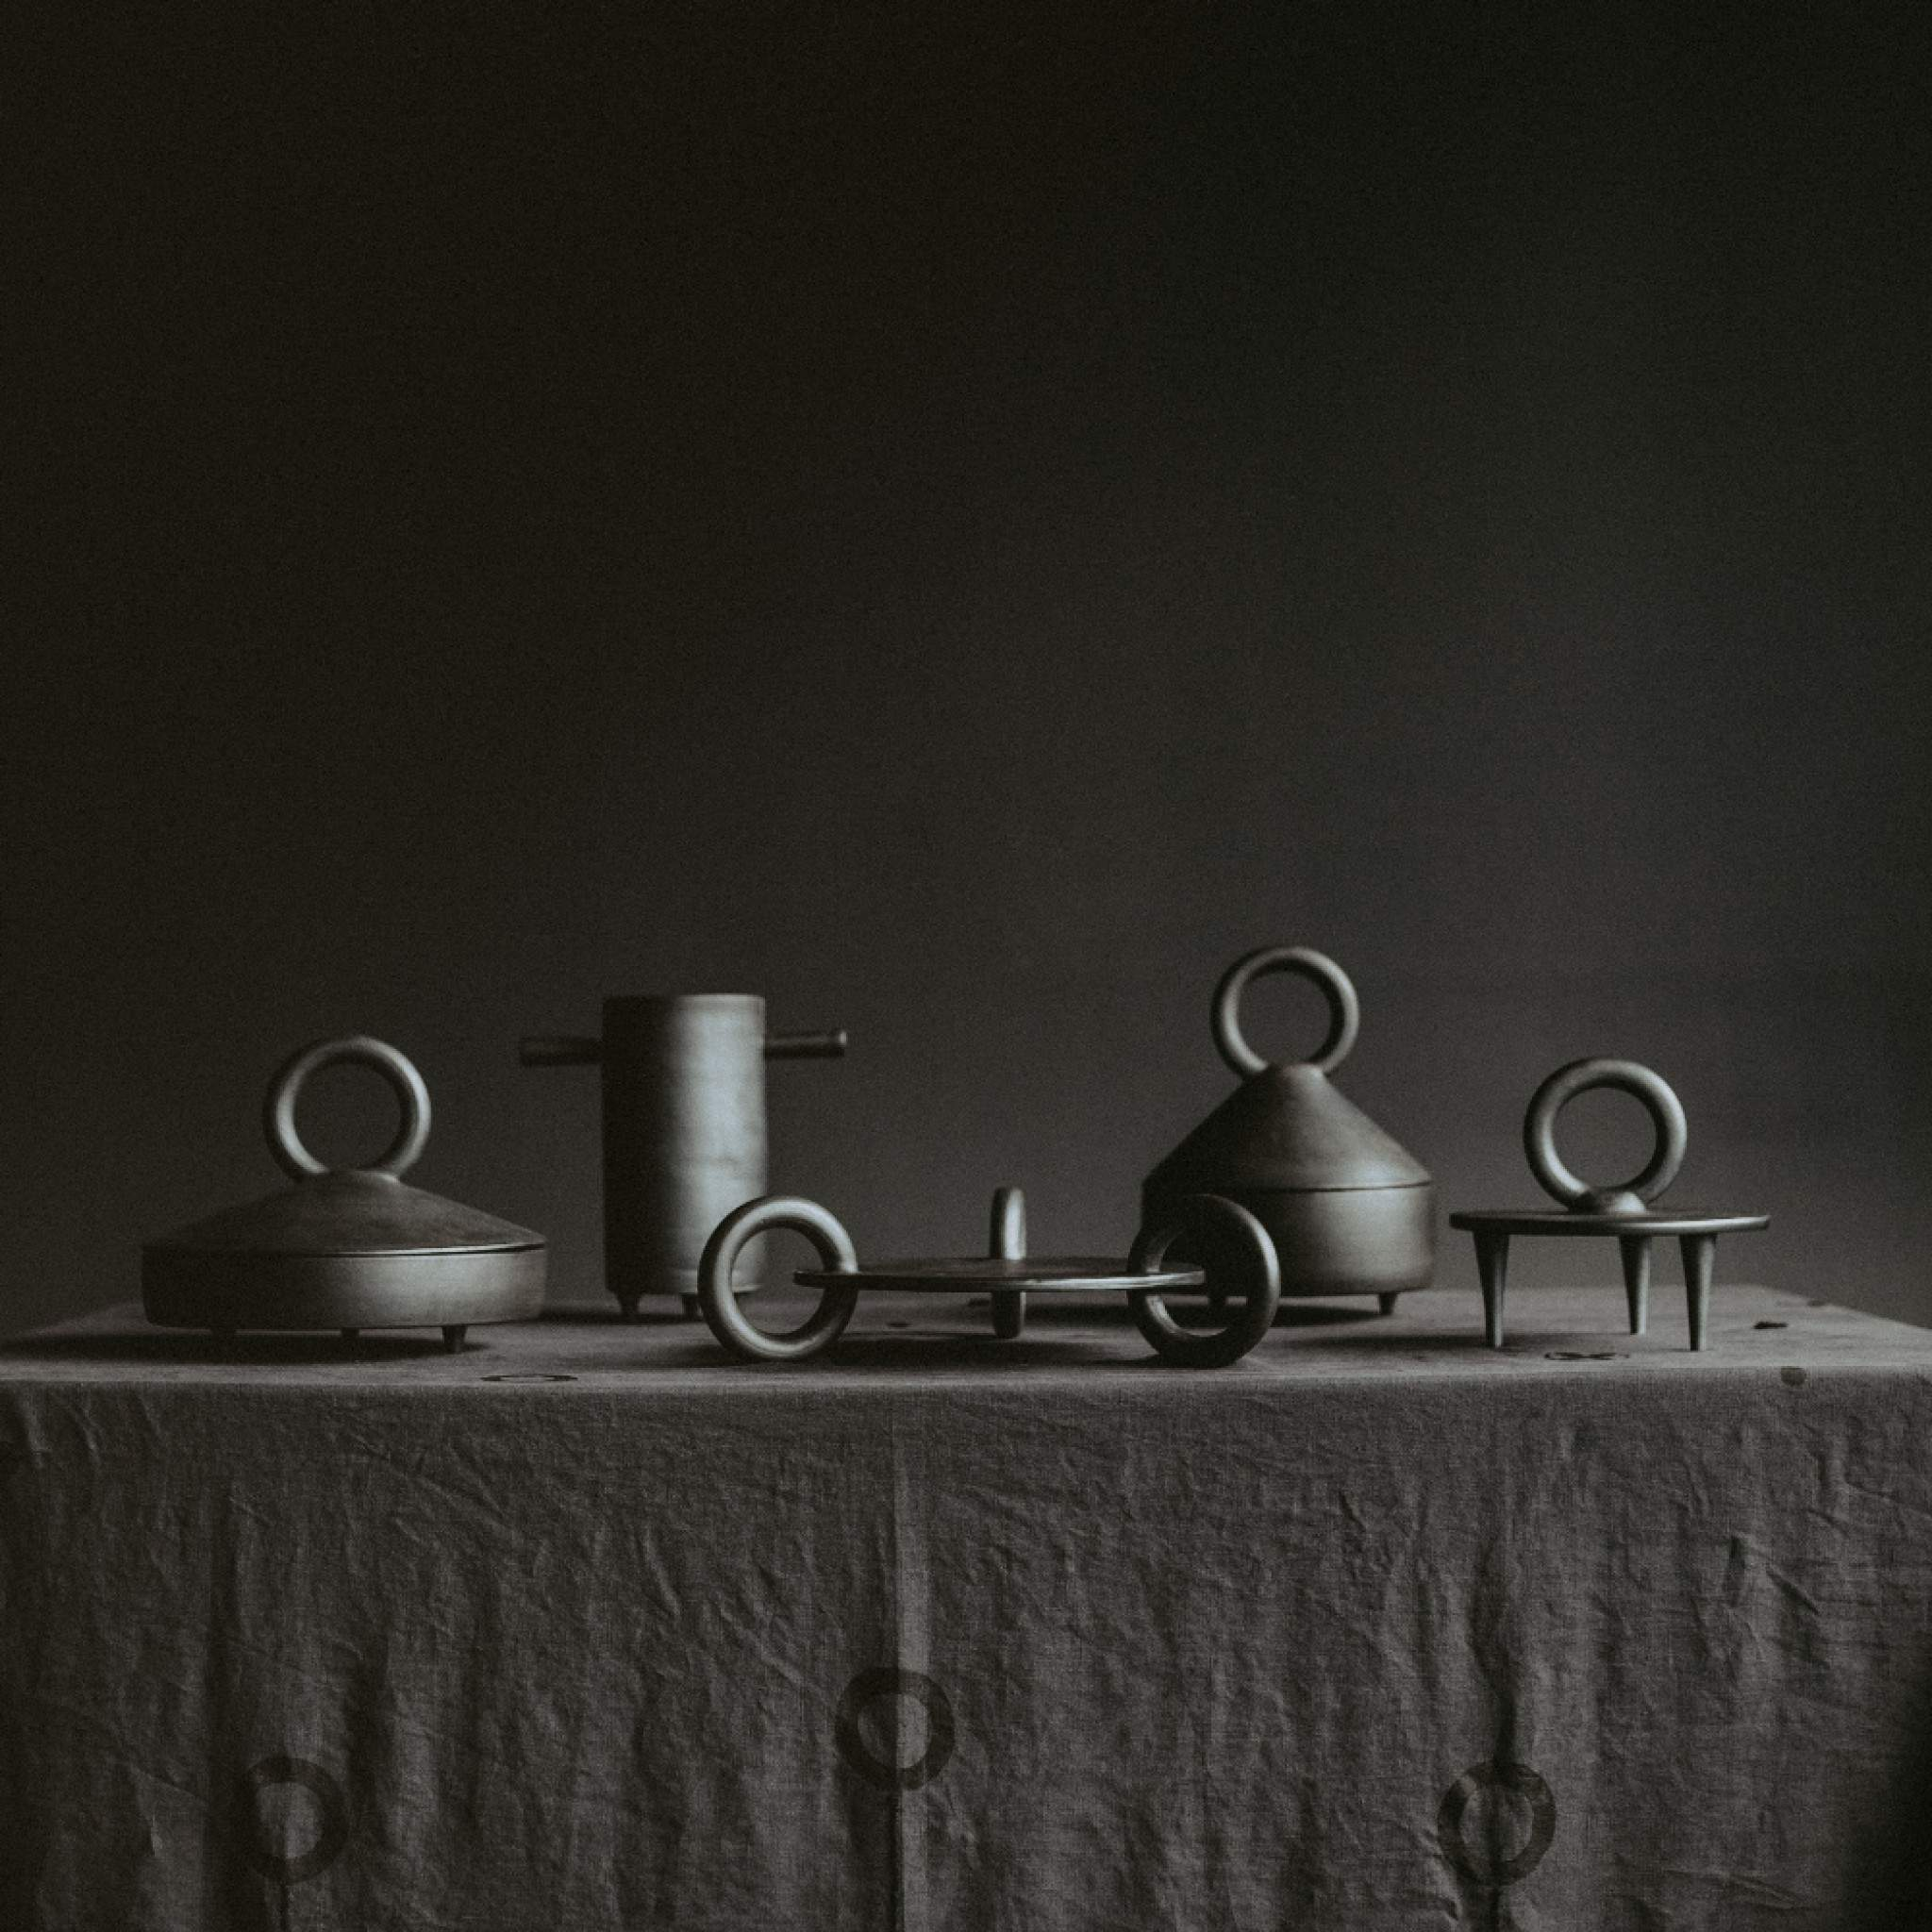 Колекція Guculiya.Tini від Hochu rayu